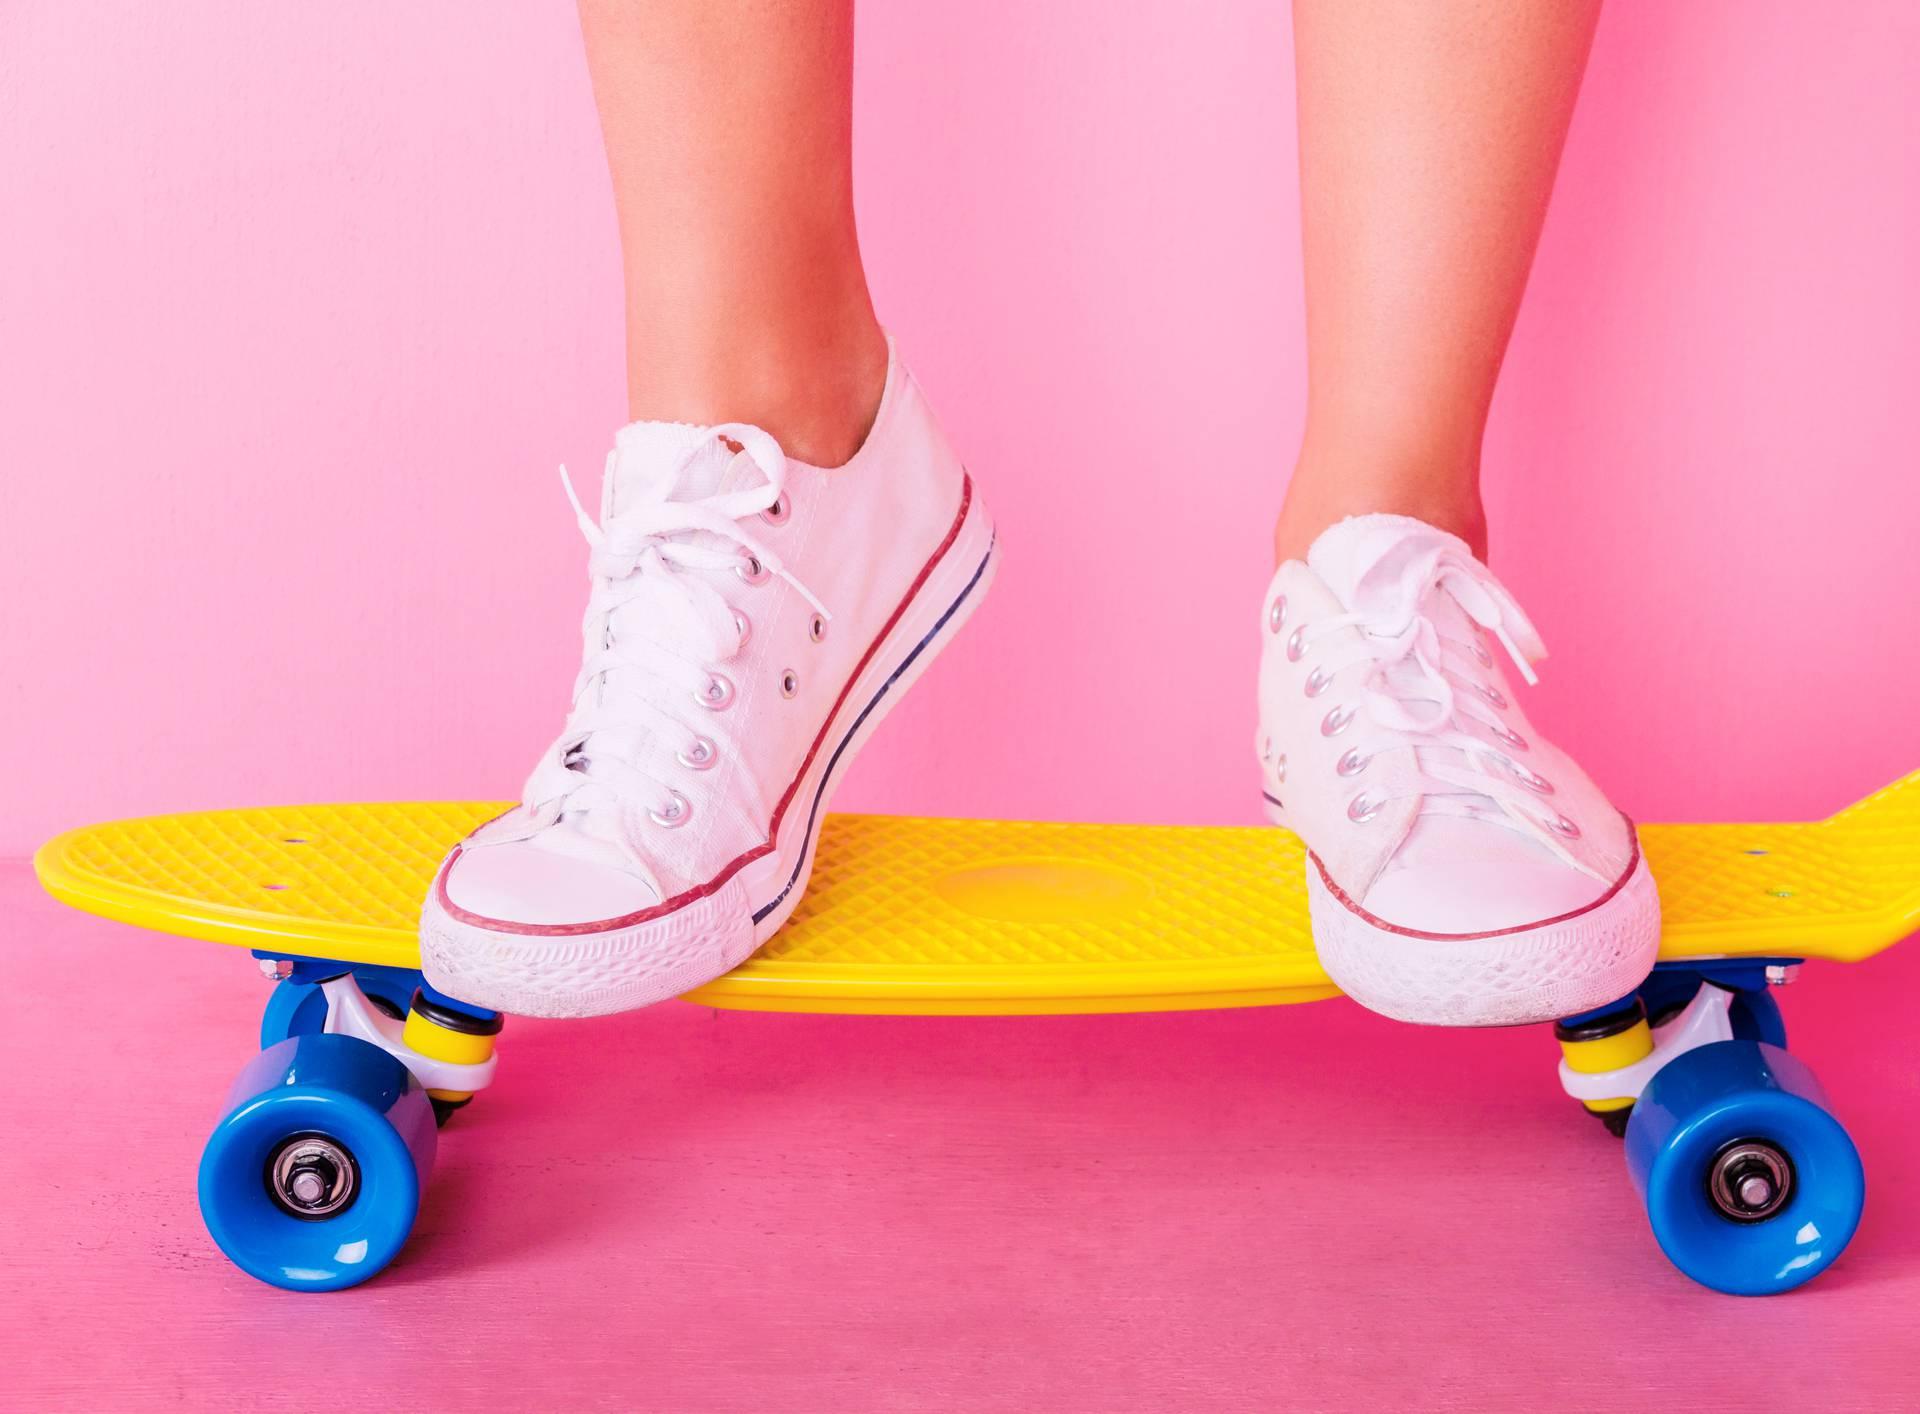 Extrem girl with skateboard